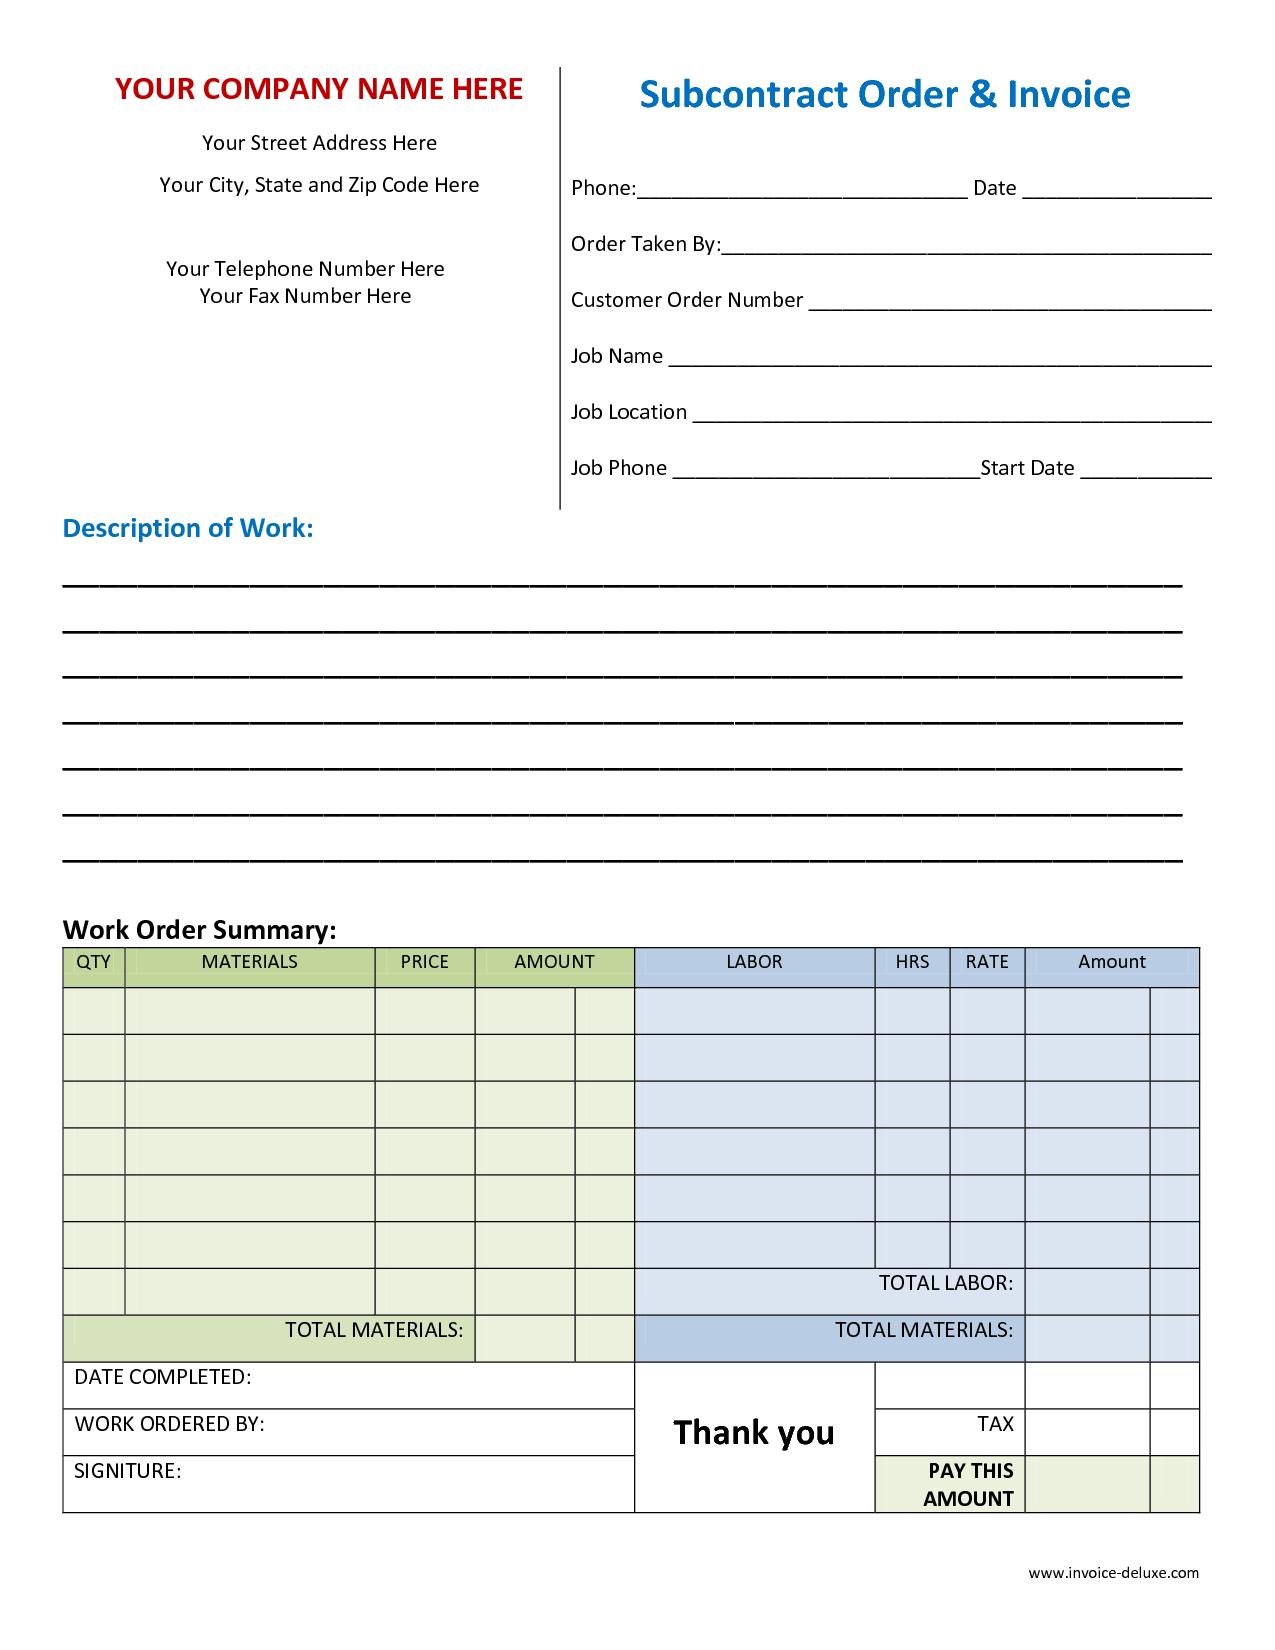 Invoice Spreadsheet Template Free Regarding Billing Spreadsheet Template And Microsoft Works Invoice Template